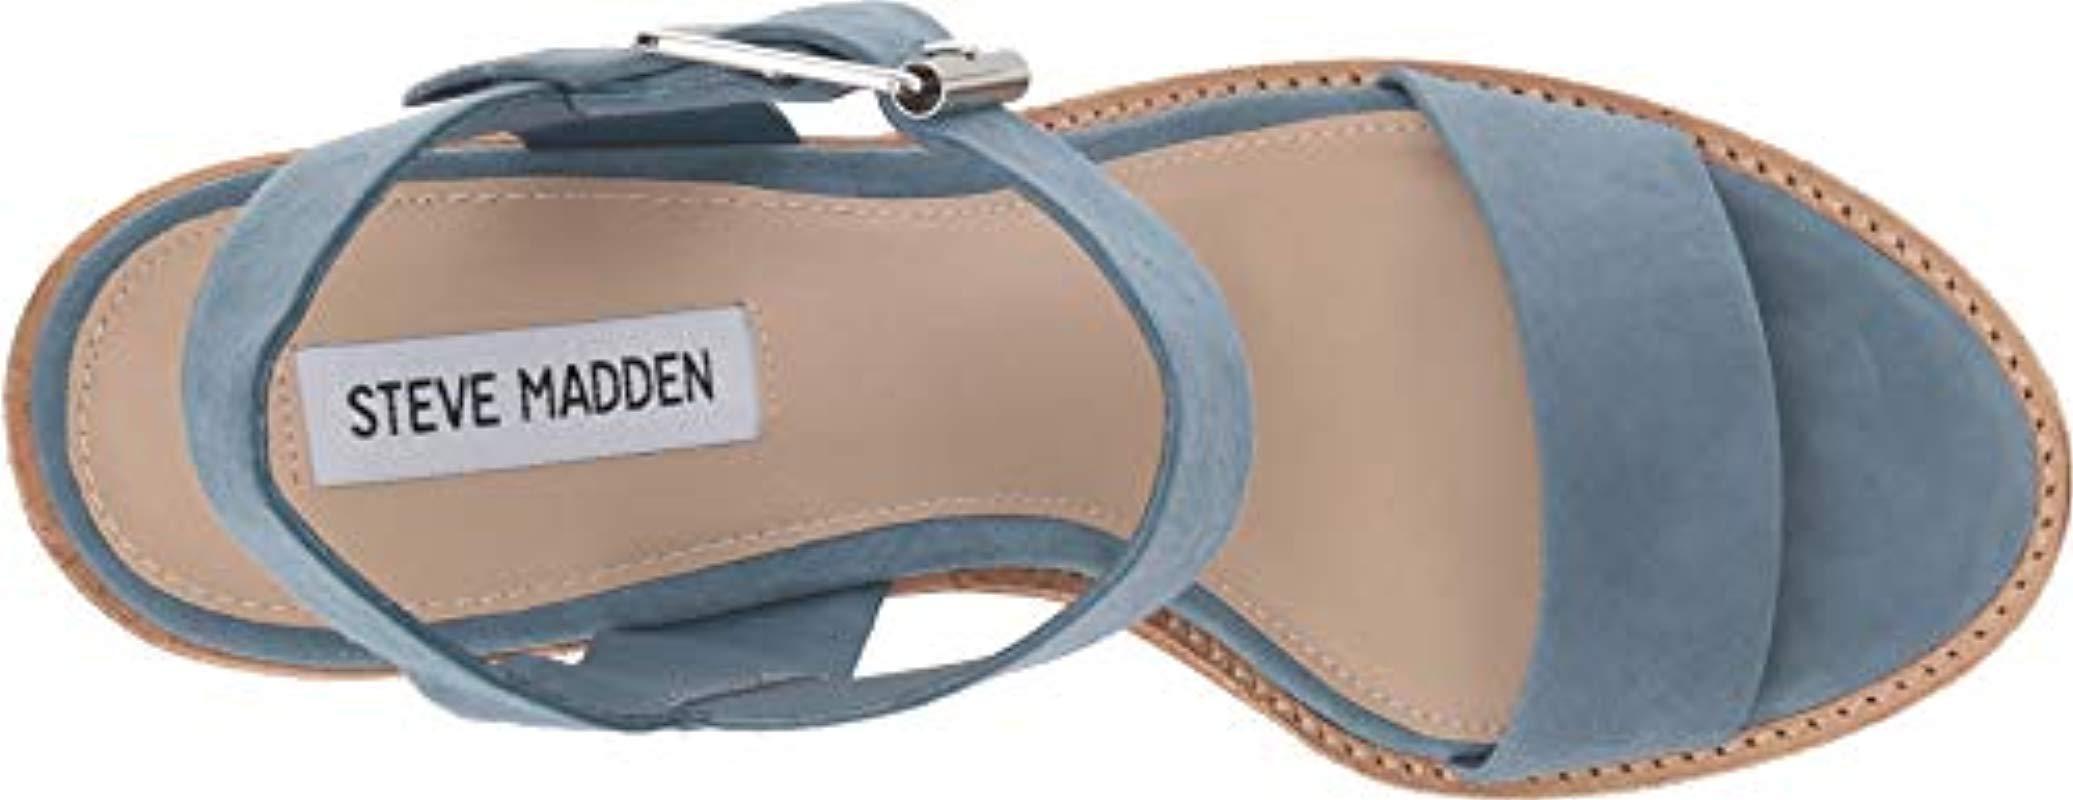 f03c2bb58f5 Steve Madden - Blue Castro Heeled Sandal - Lyst. View fullscreen